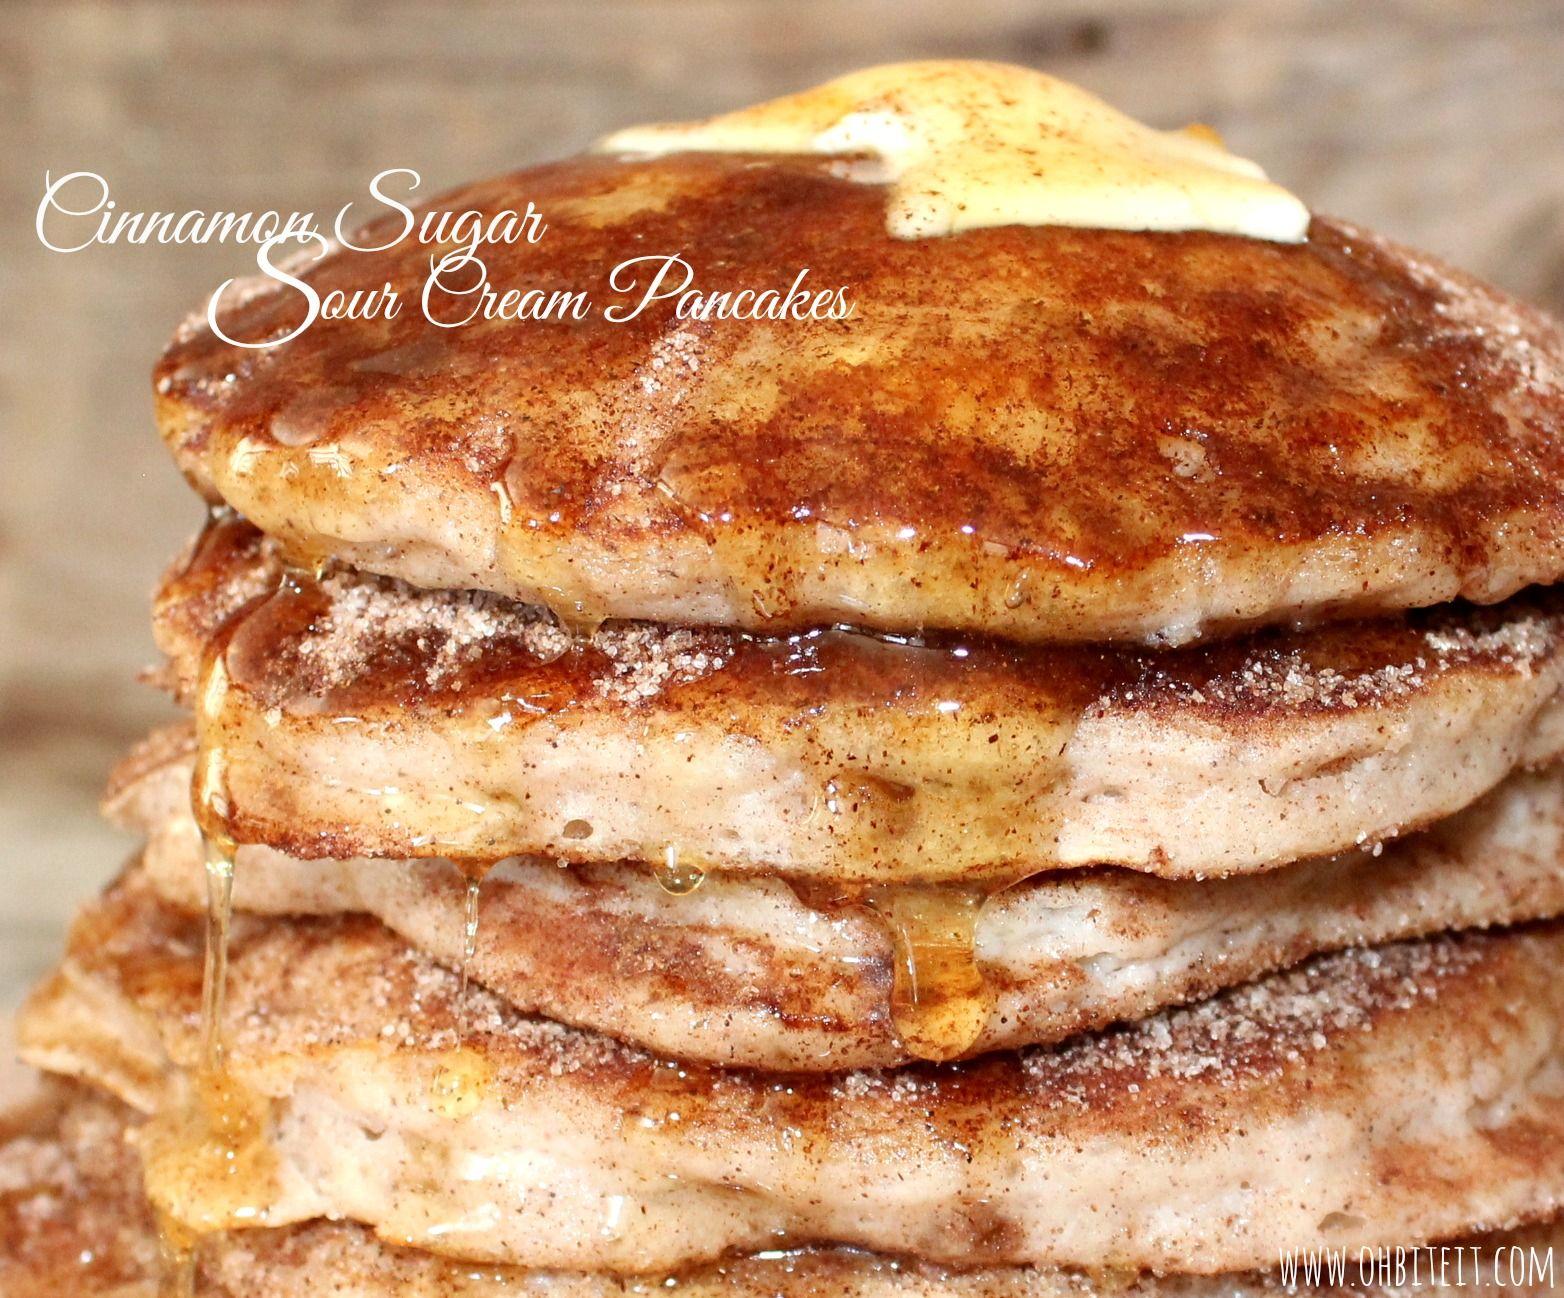 Cinnamon Sugar Sour Cream Pancakes Breakfast Dishes Sour Cream Pancakes Recipes